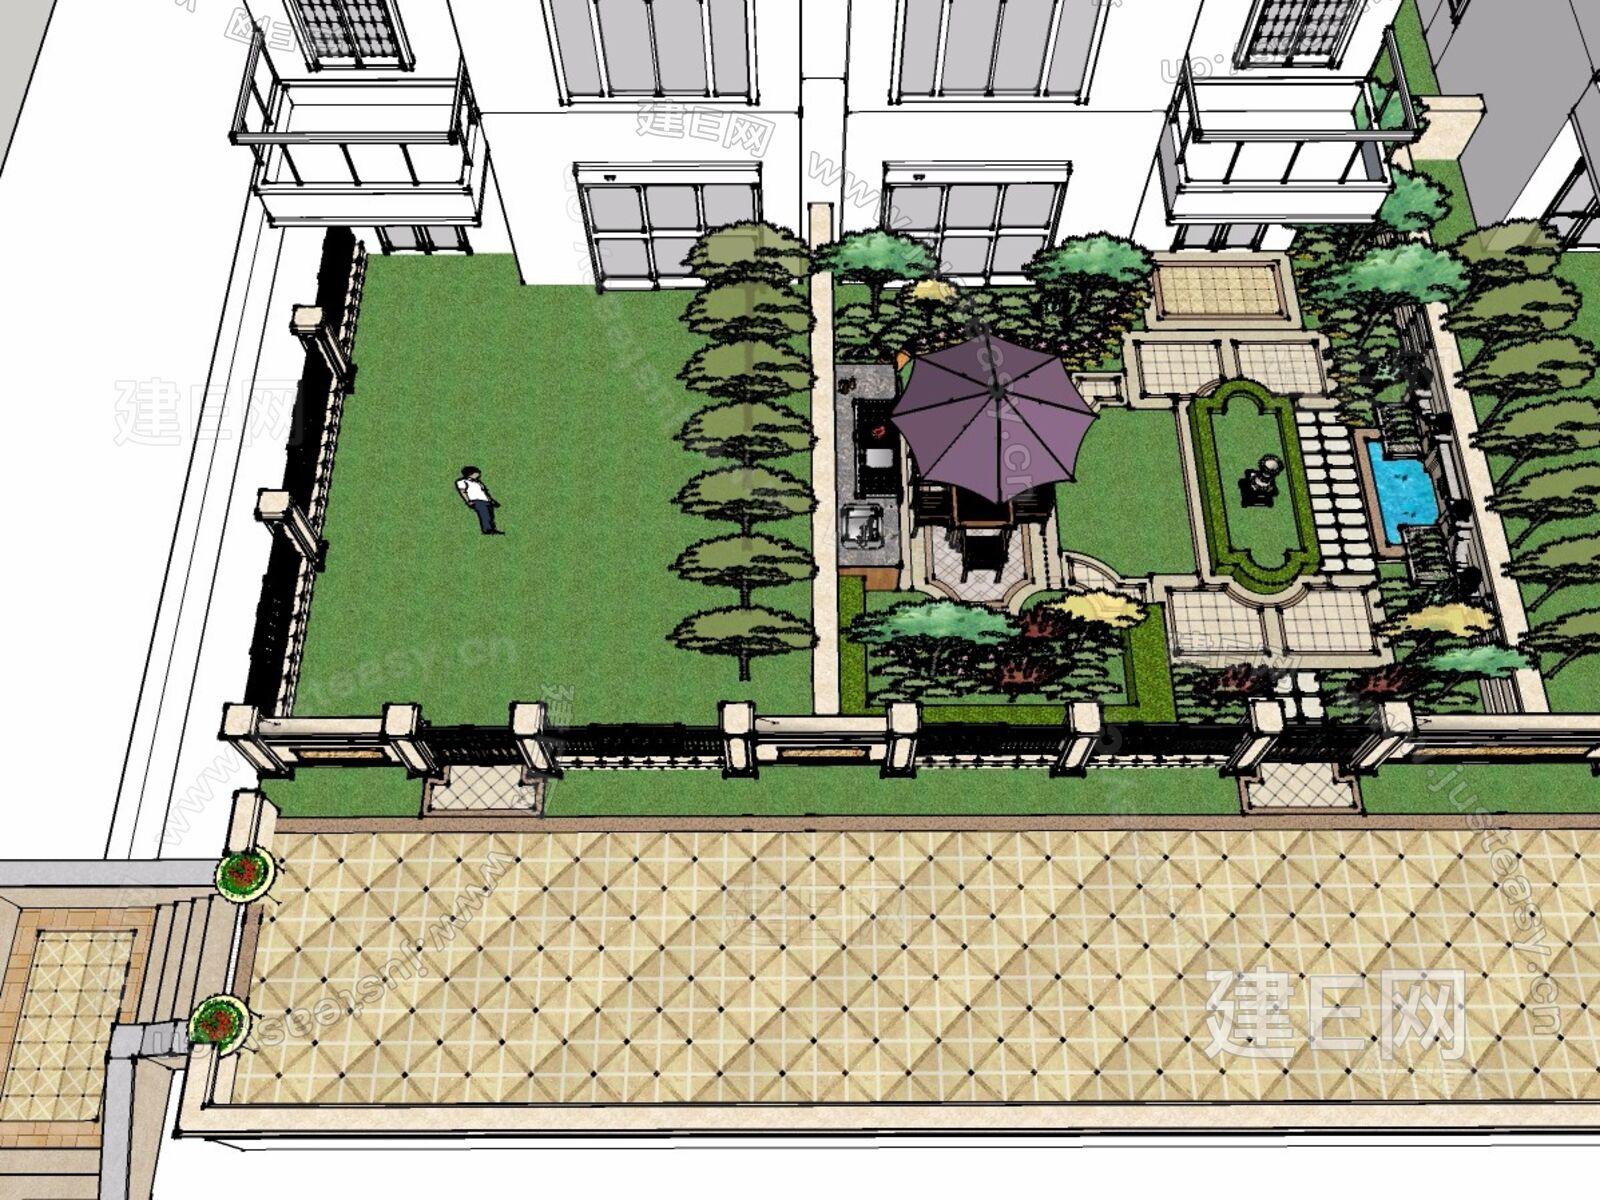 su模型首页 景观 住宅景观 庭院景观[模型id:4934]